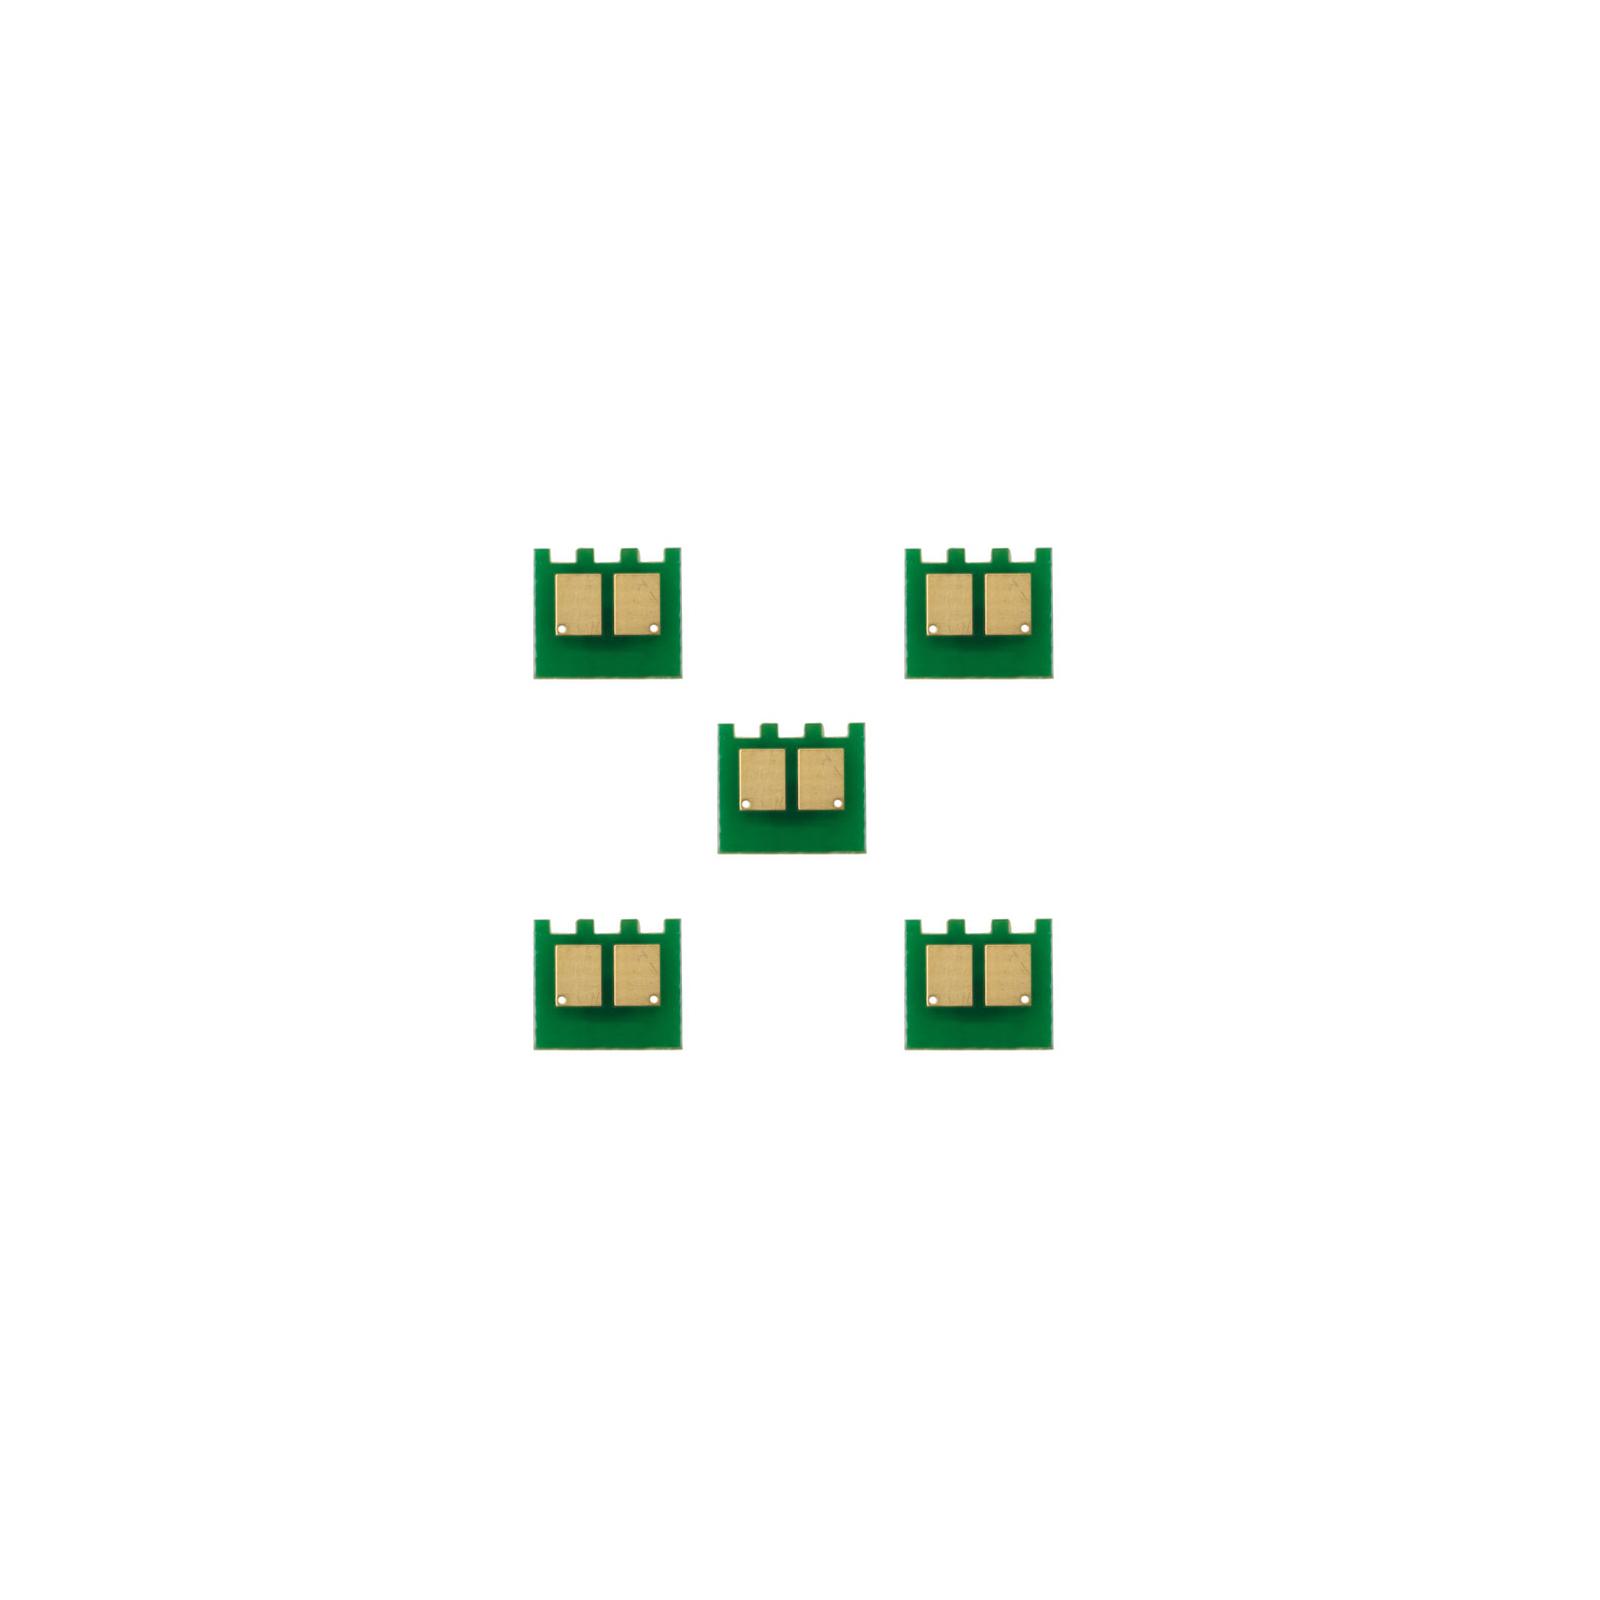 Чип для картриджа HP CLJ Pro M476 (CF383A) 2.7k magenta Static Control (H476CP-MA)